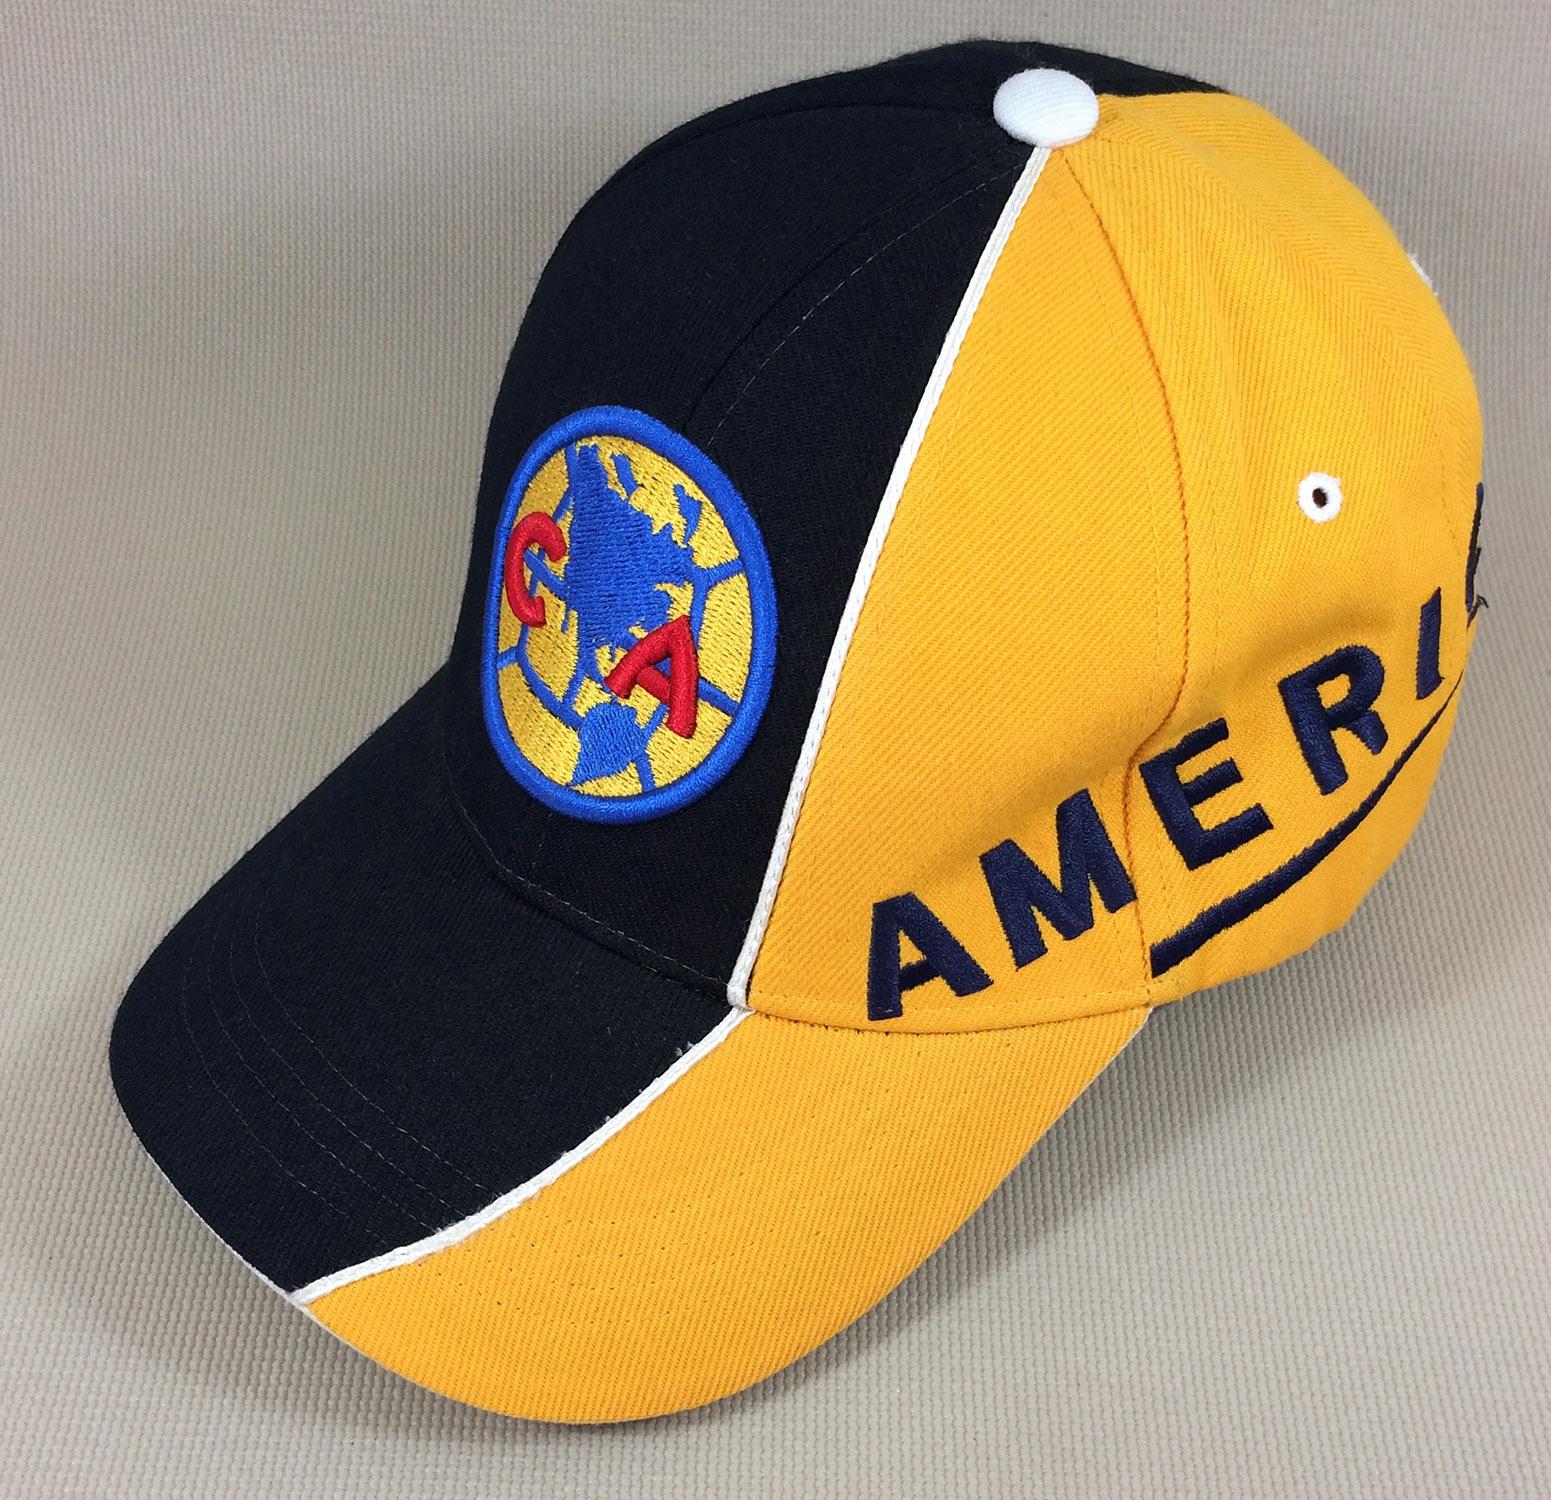 f51dbf4940a2eb Club America Cap - SportsHistoryCollectibles.com